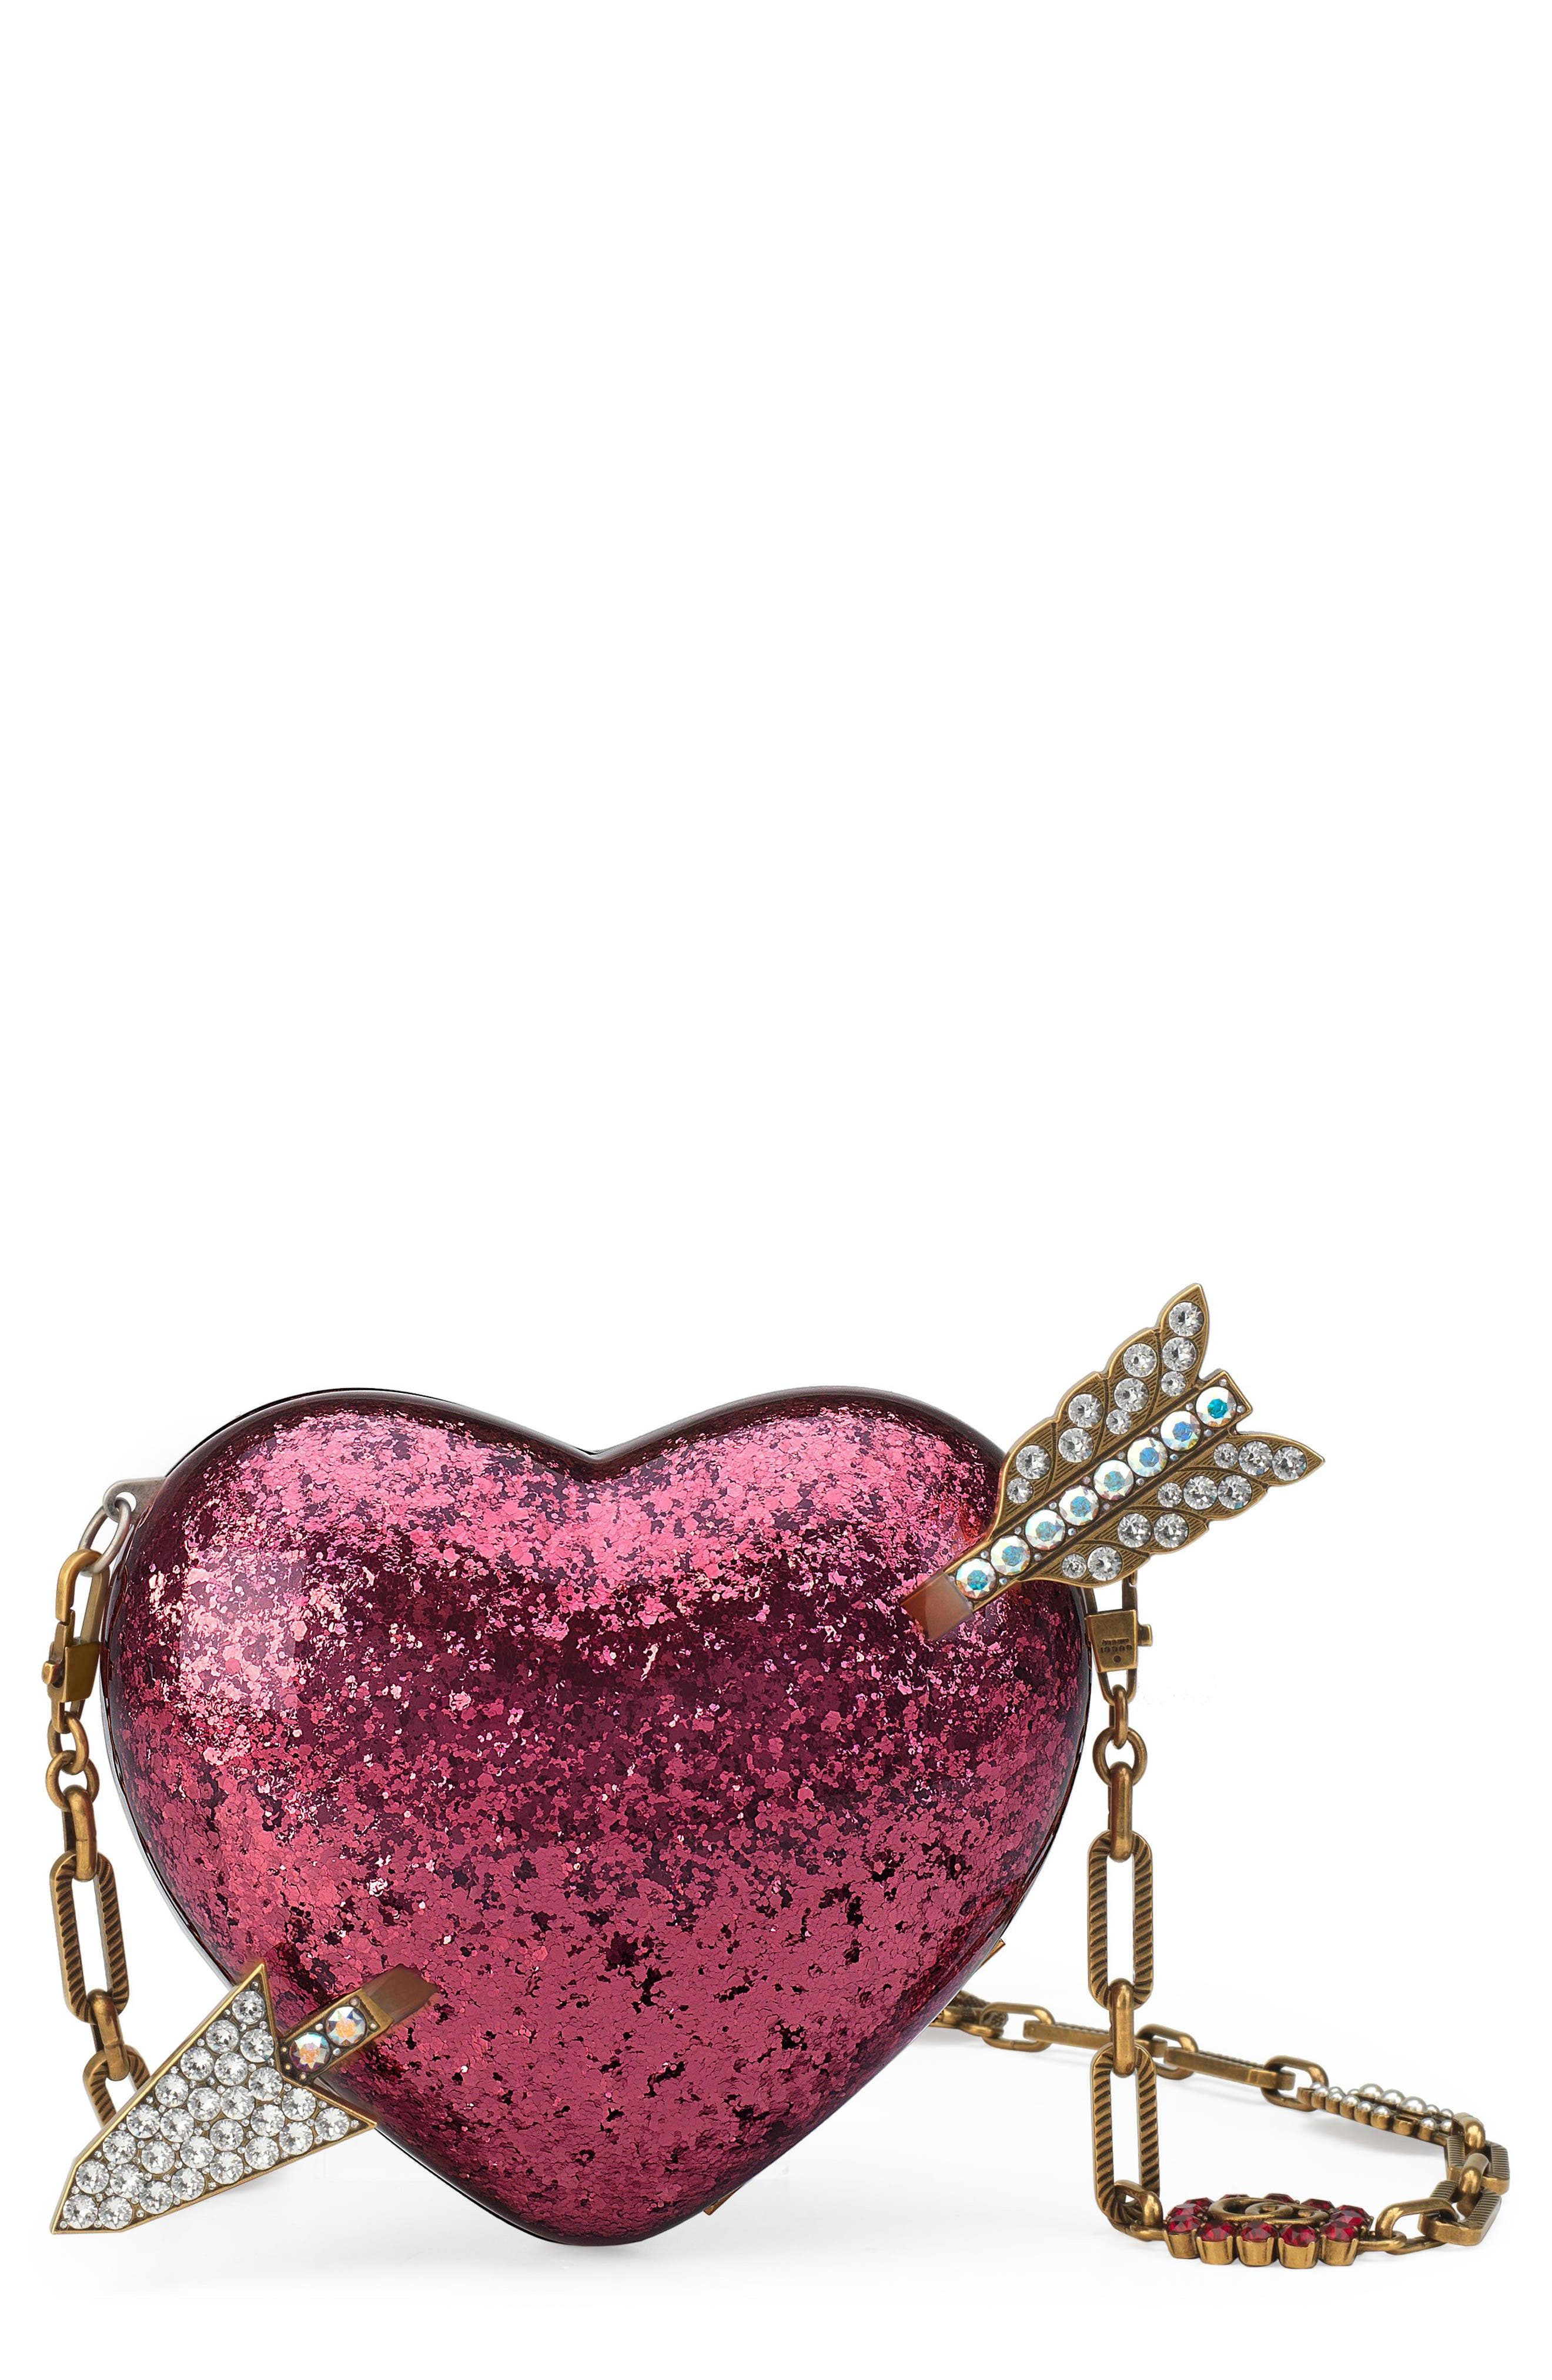 Broadway Glitter Heart Minaudière,                             Main thumbnail 1, color,                             Fuxia Multi/ Cream